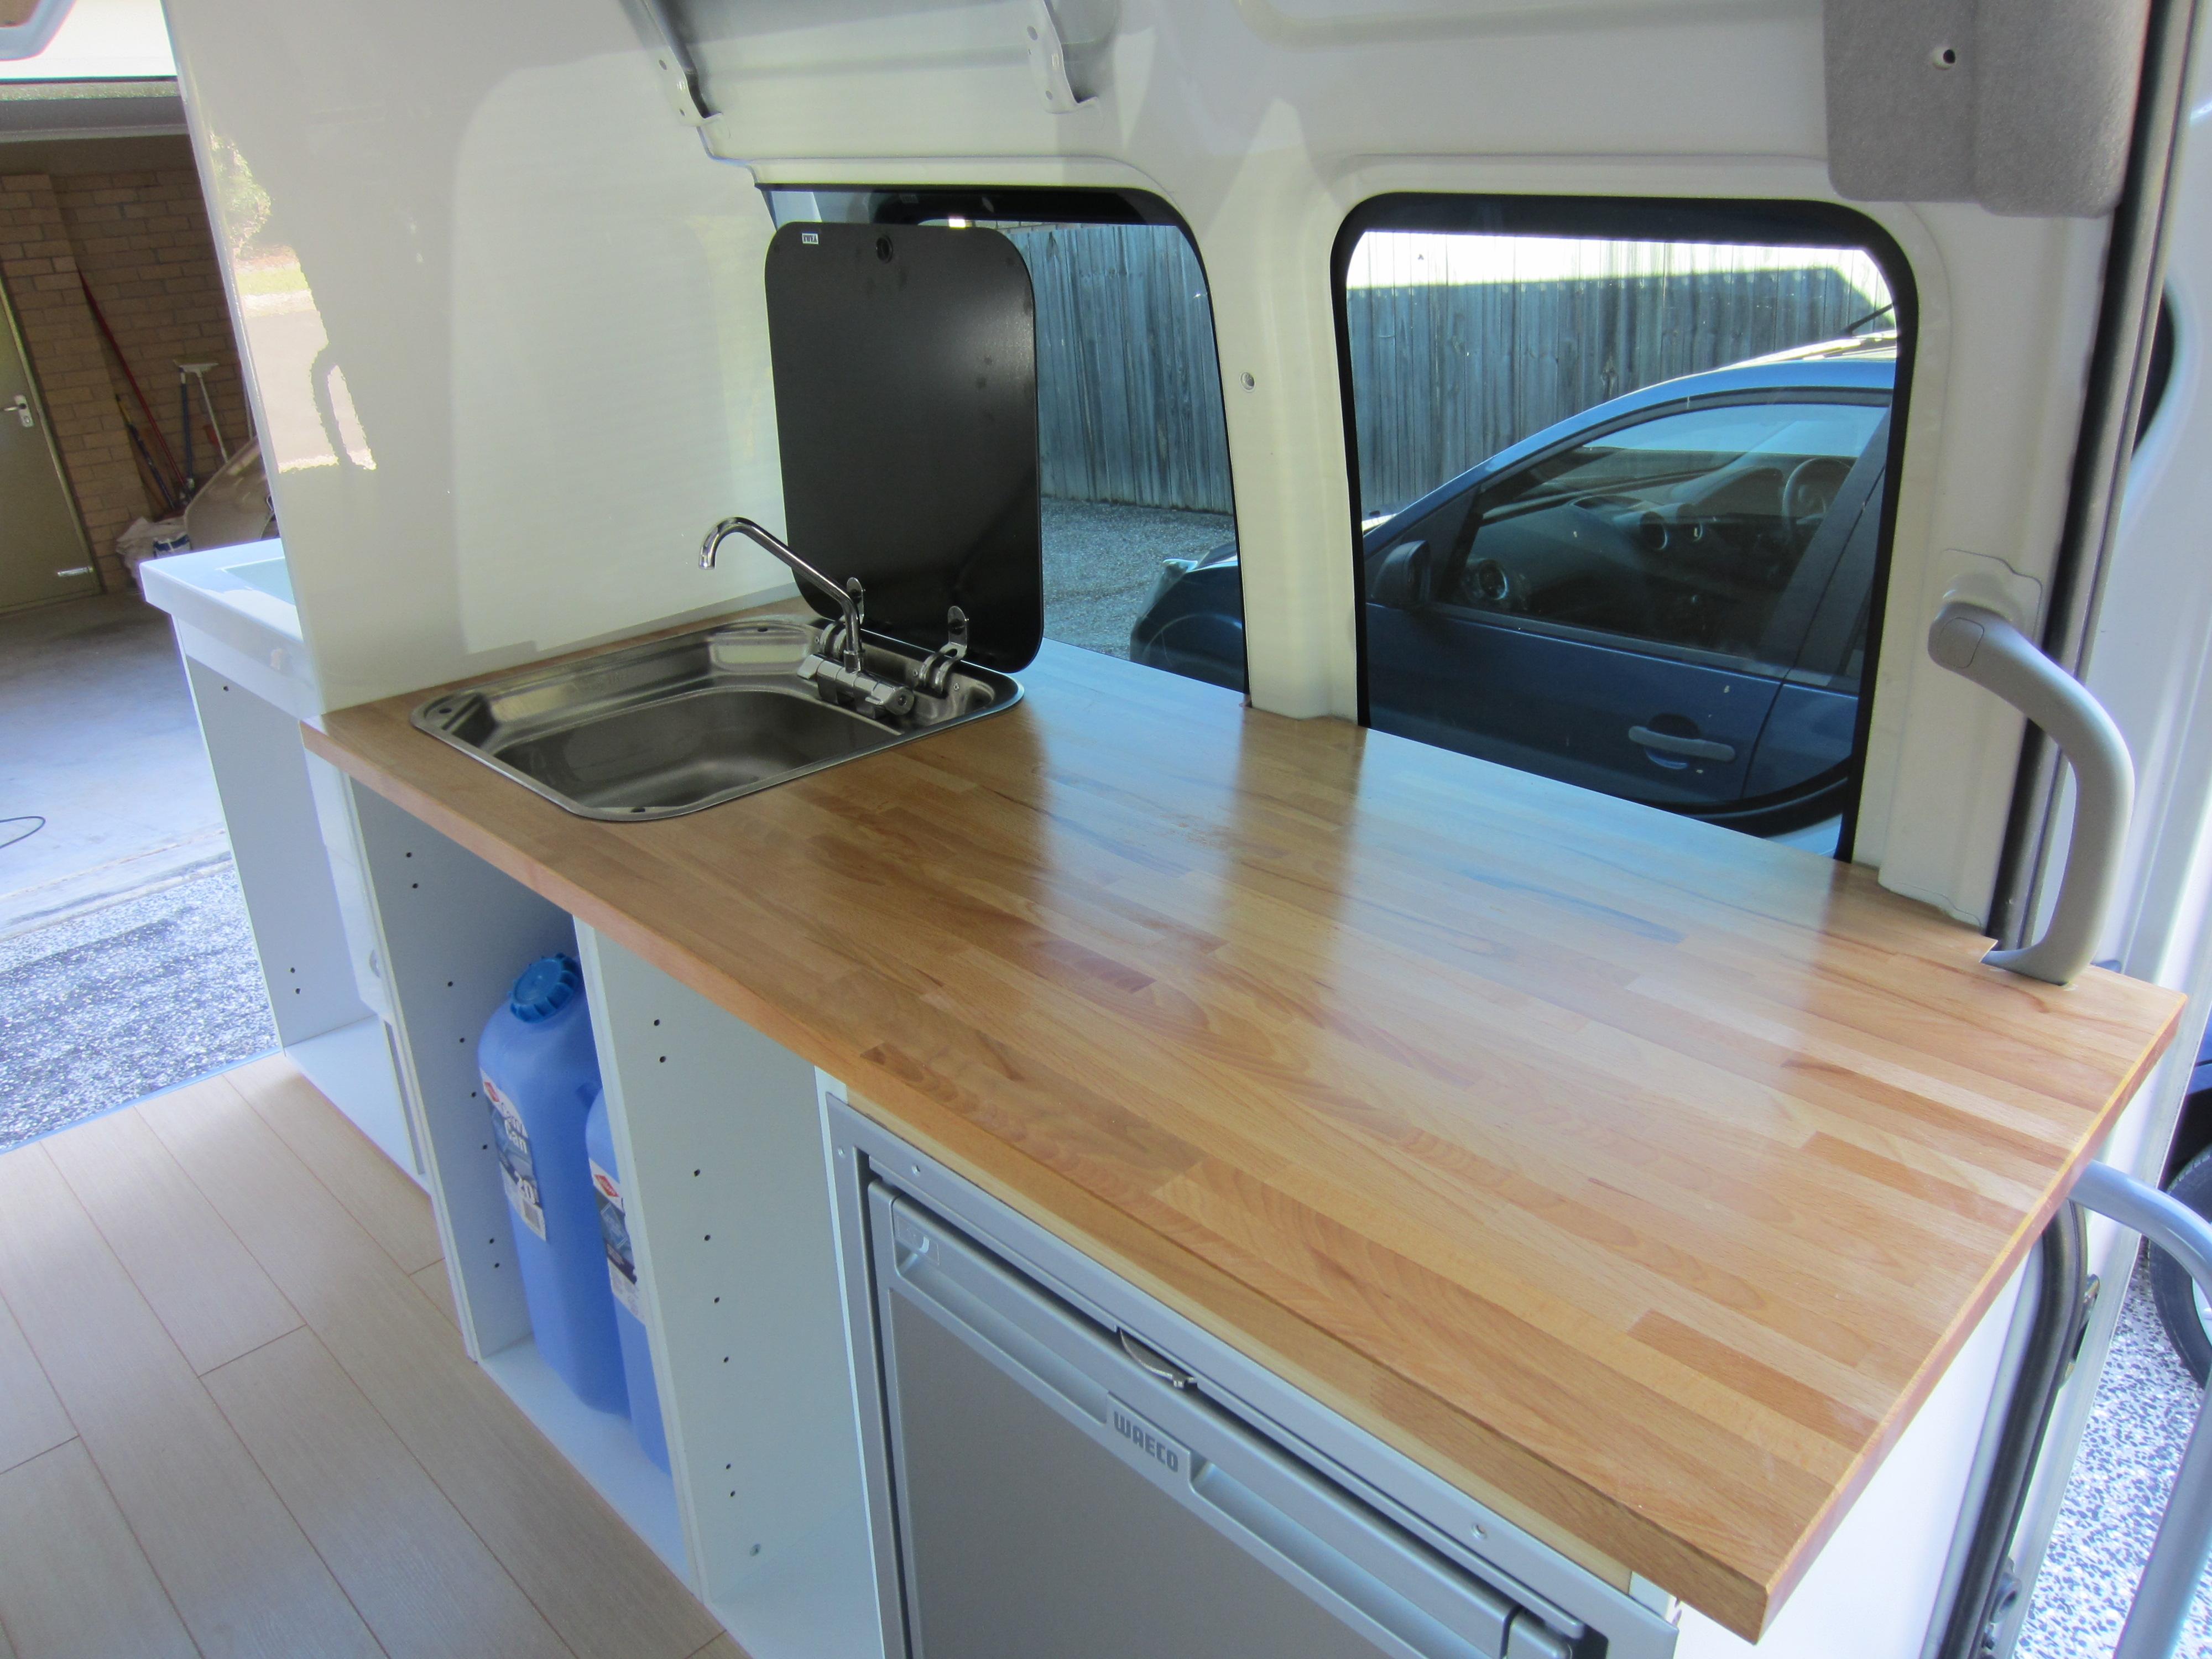 campervan kitchen and cabinets rv kitchen cabinets Neither